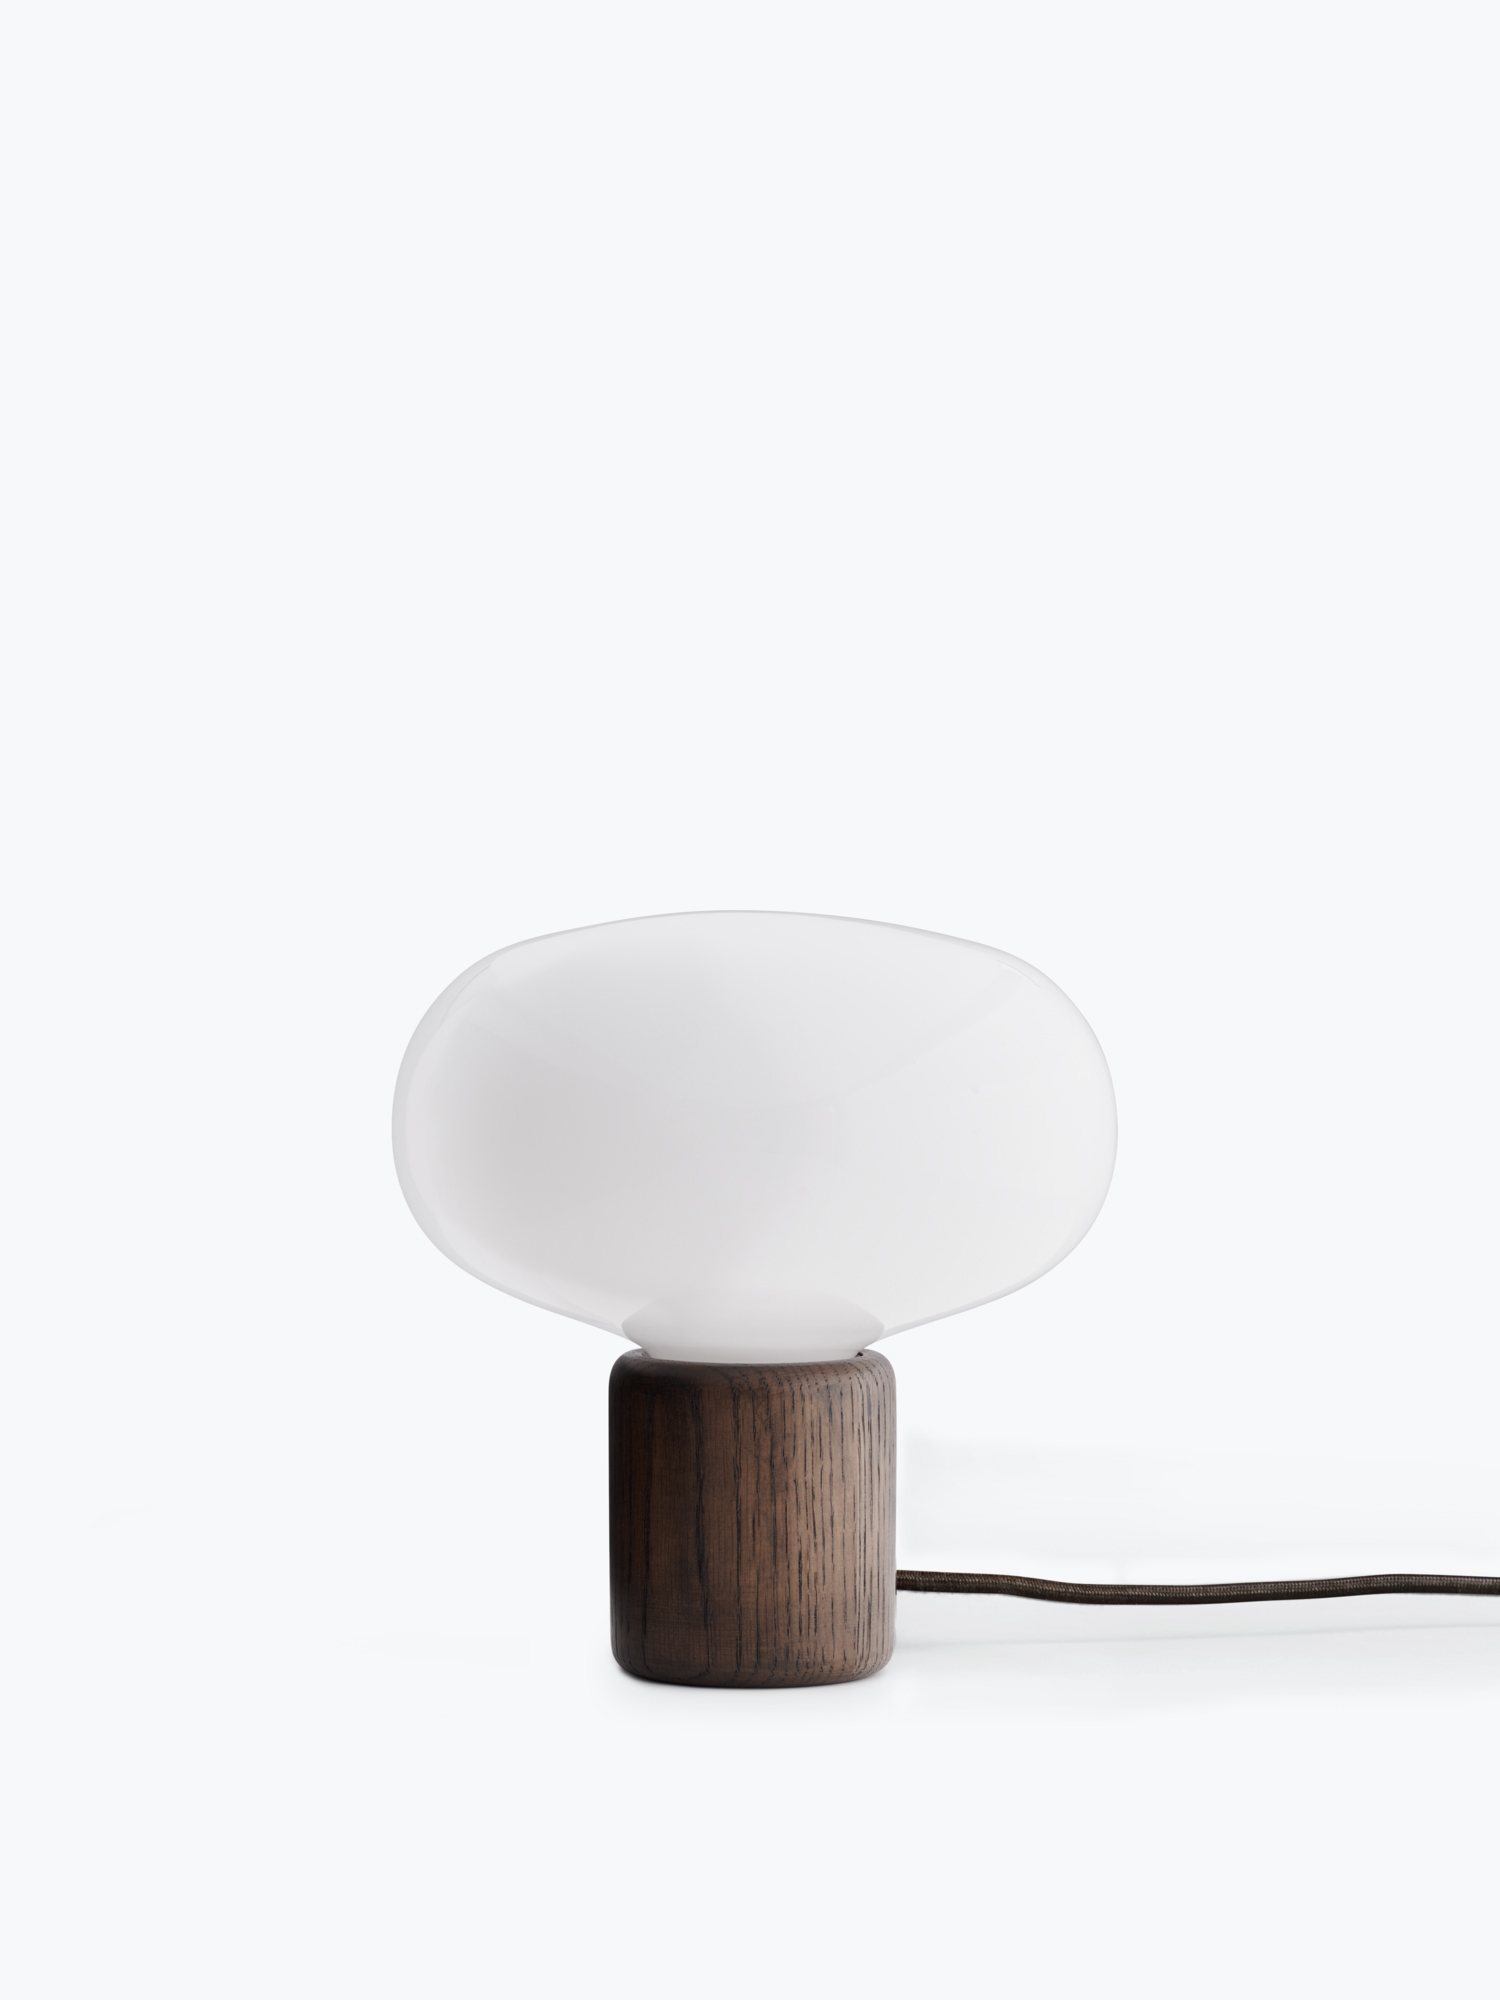 Karl Johan lamp